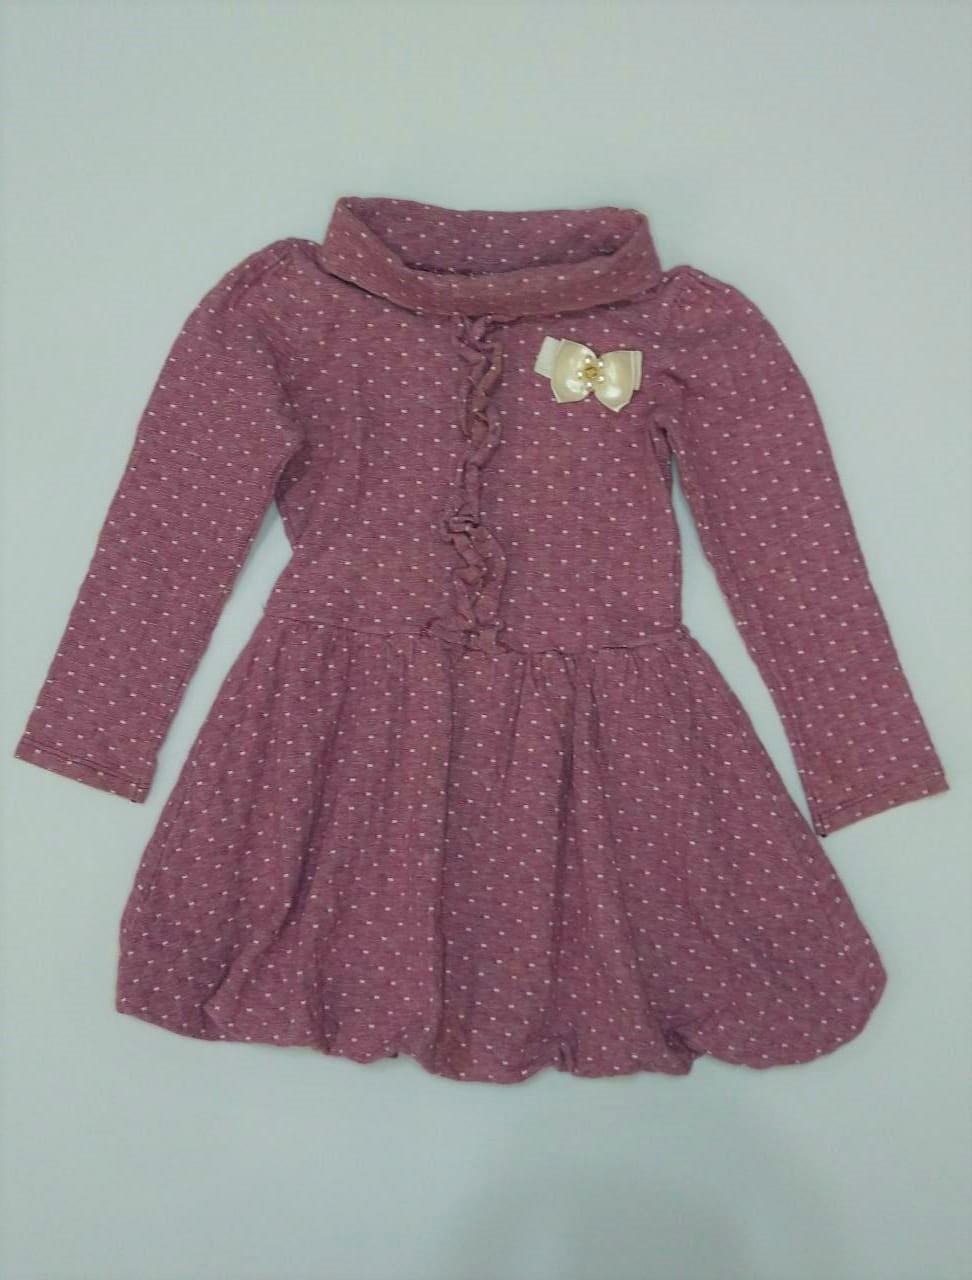 Vestido Infantil Manga Longa - Tamanho 4